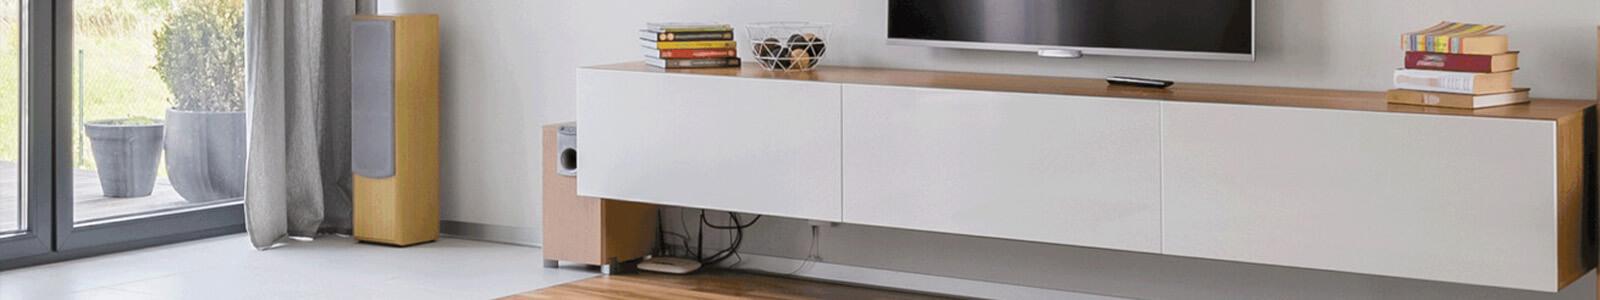 ION Design Furniture Banner